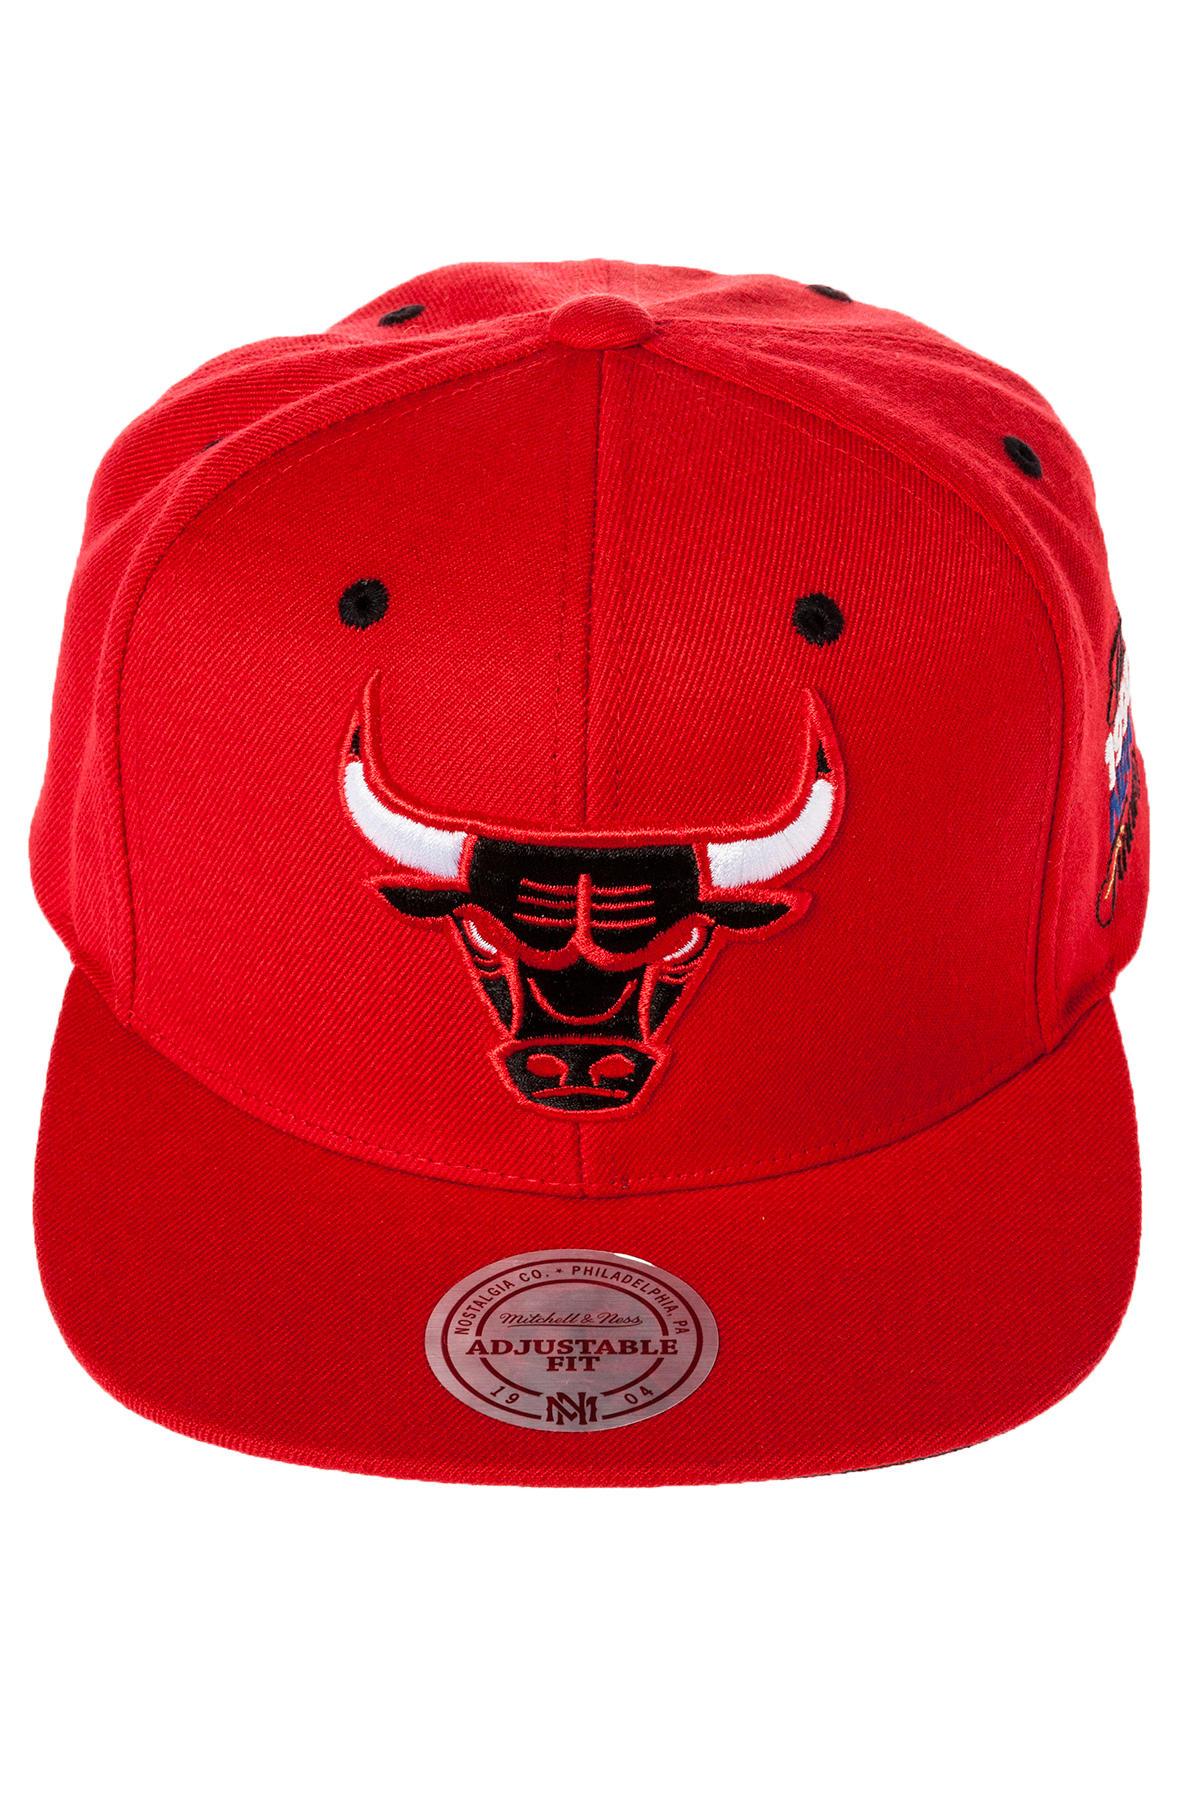 99c194d4e6e76 Lyst - Mitchell   Ness The Chicago Bulls Commemorative Snapback in ...